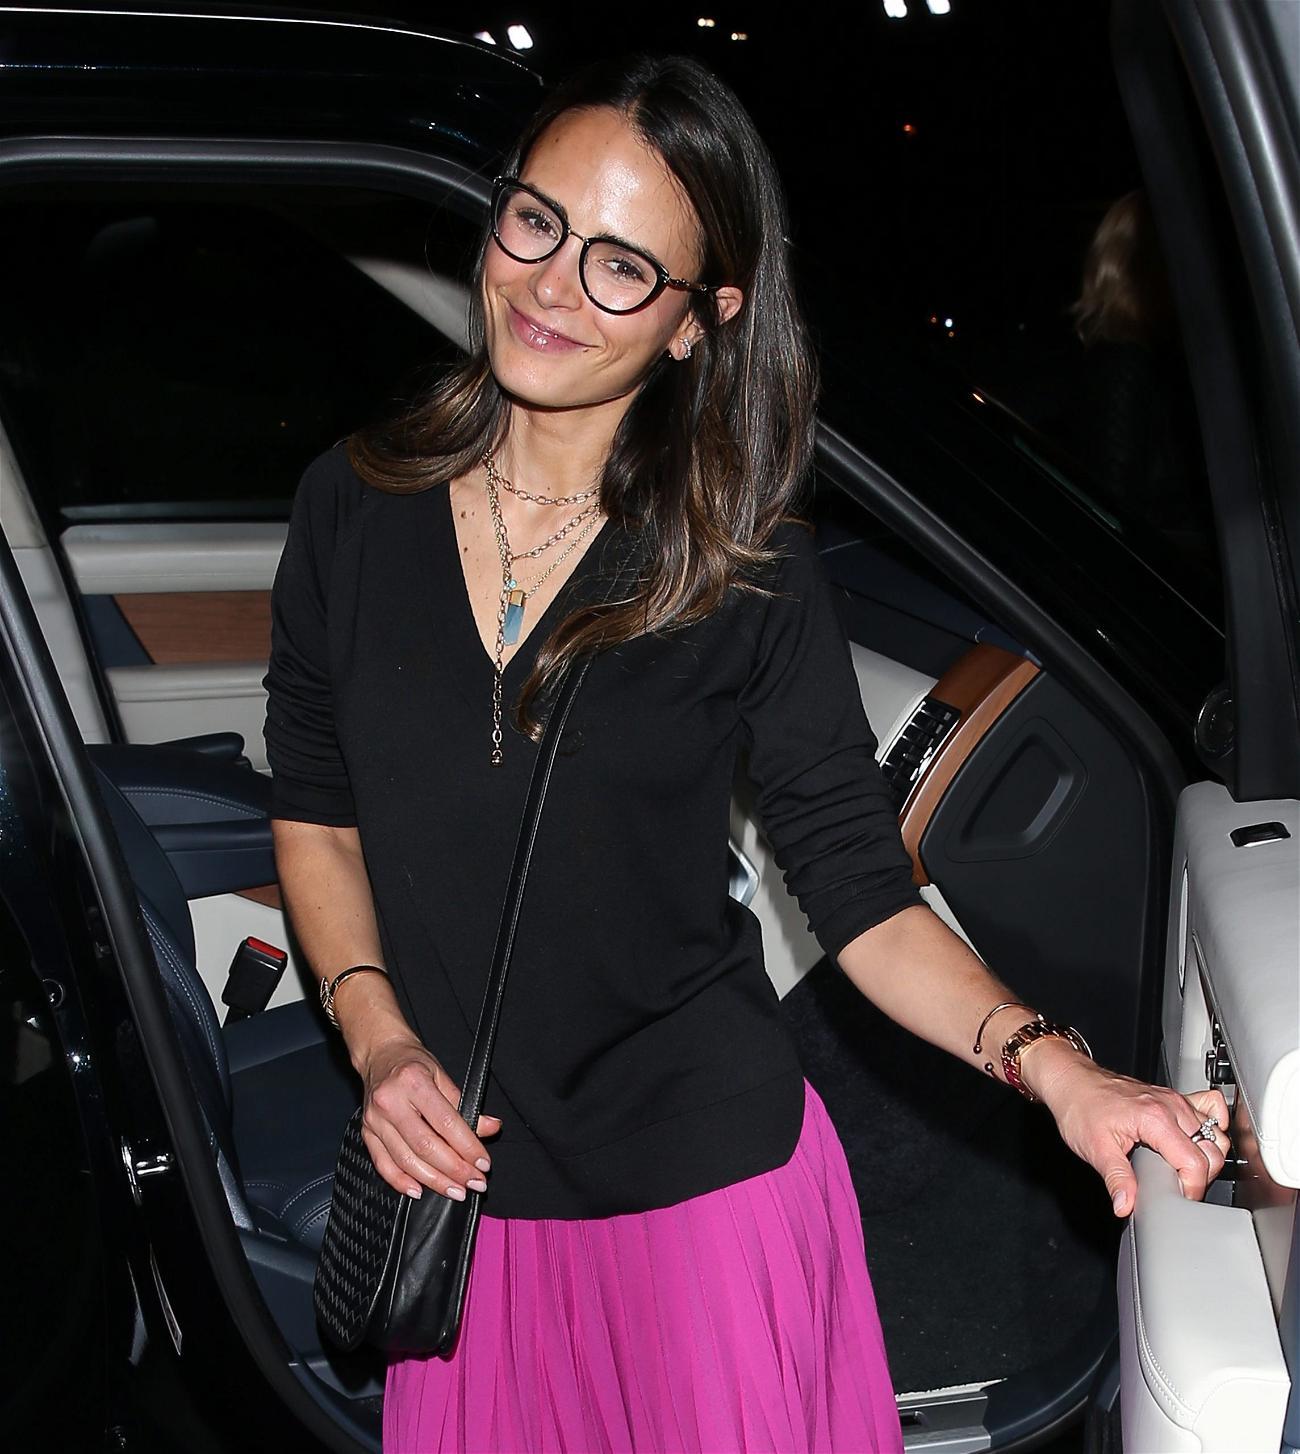 Jordana Brewster Settles Divorce With Ex-Husband